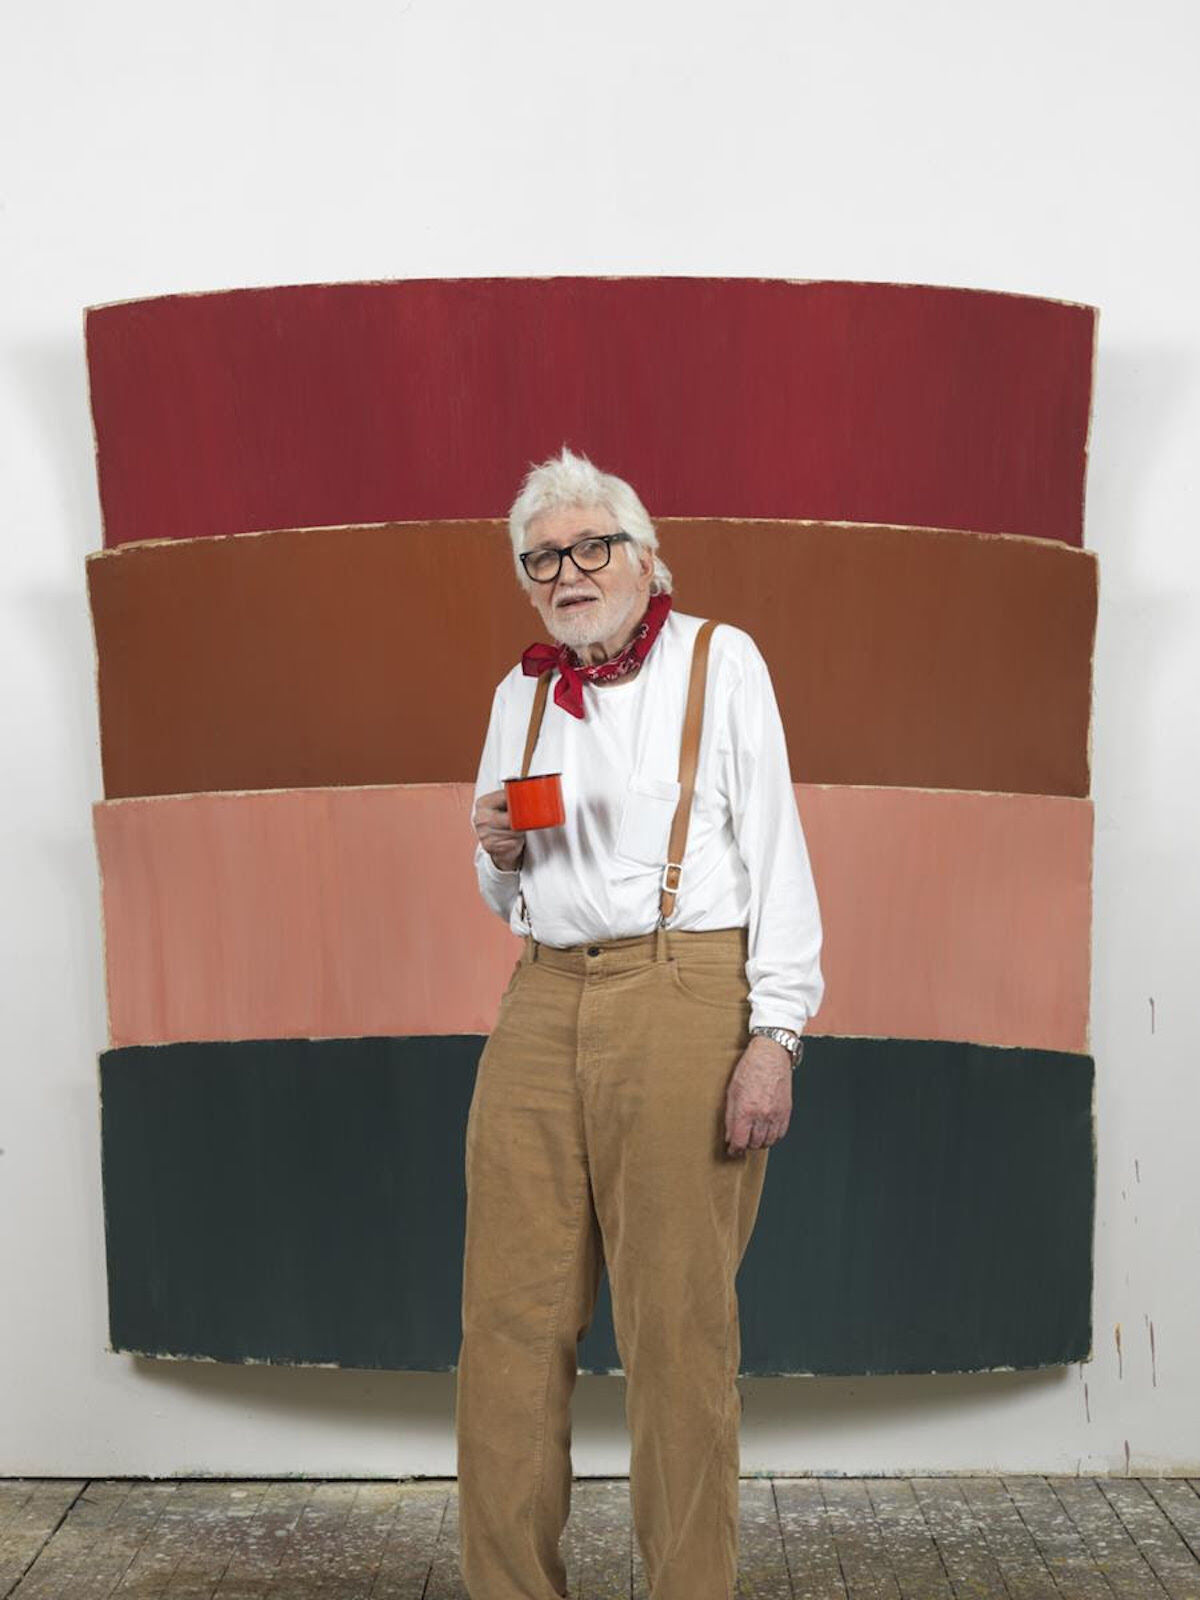 Ron Gorchov at his Brooklyn Studio. Photo by Brian Buckley, 2012.